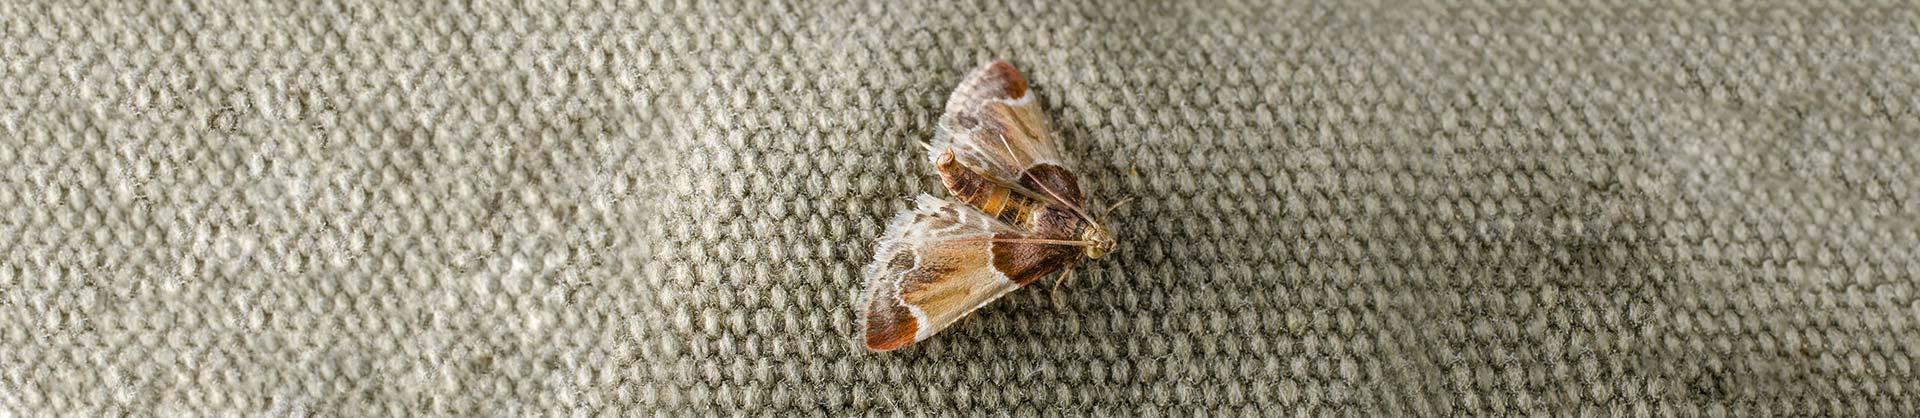 Pantry Moth Pest Control